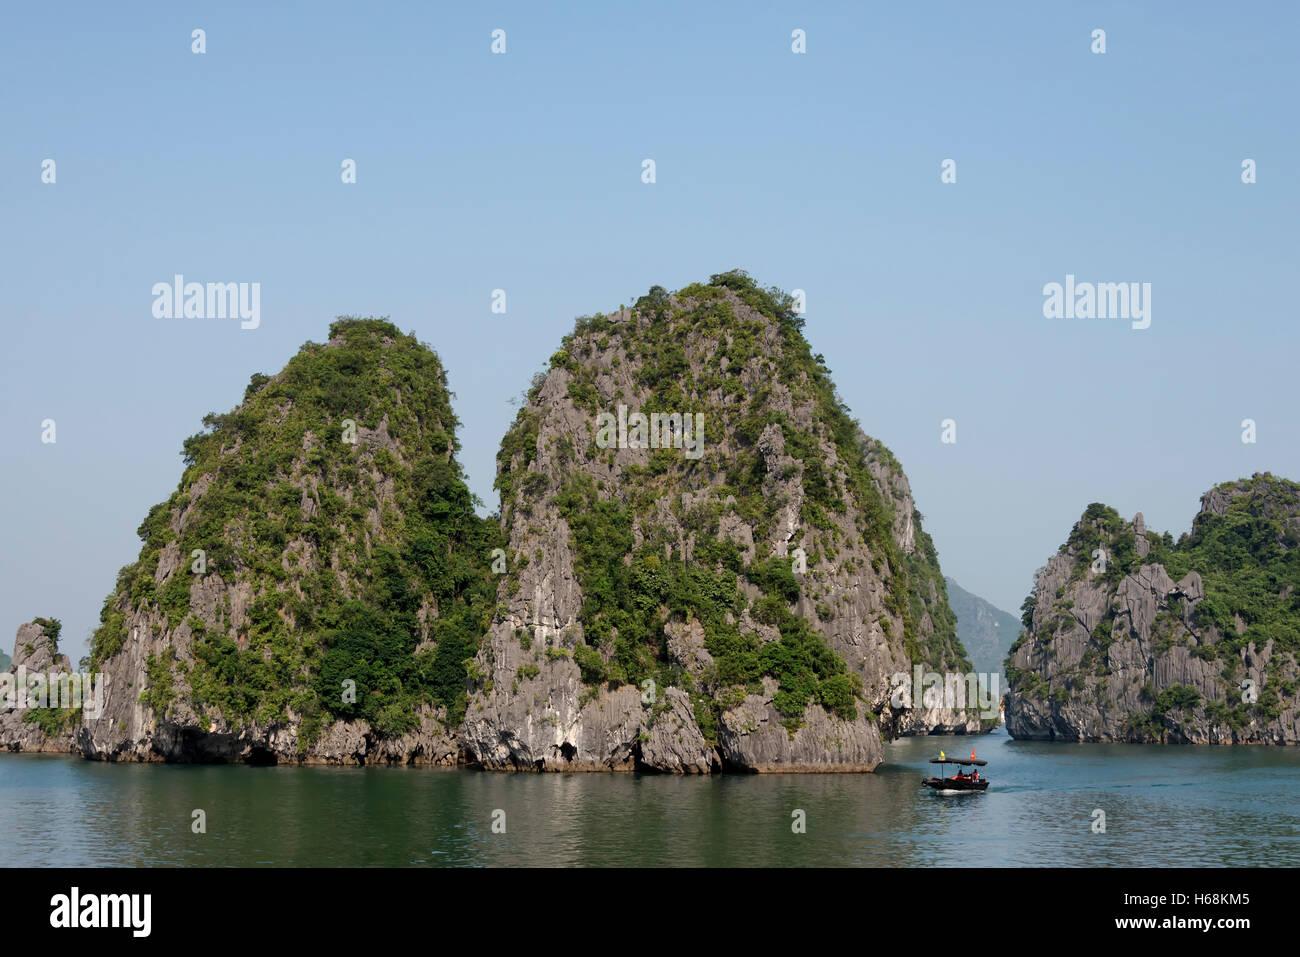 Beautiful rock formations in Ha Long Bay, Vietnam - Stock Image